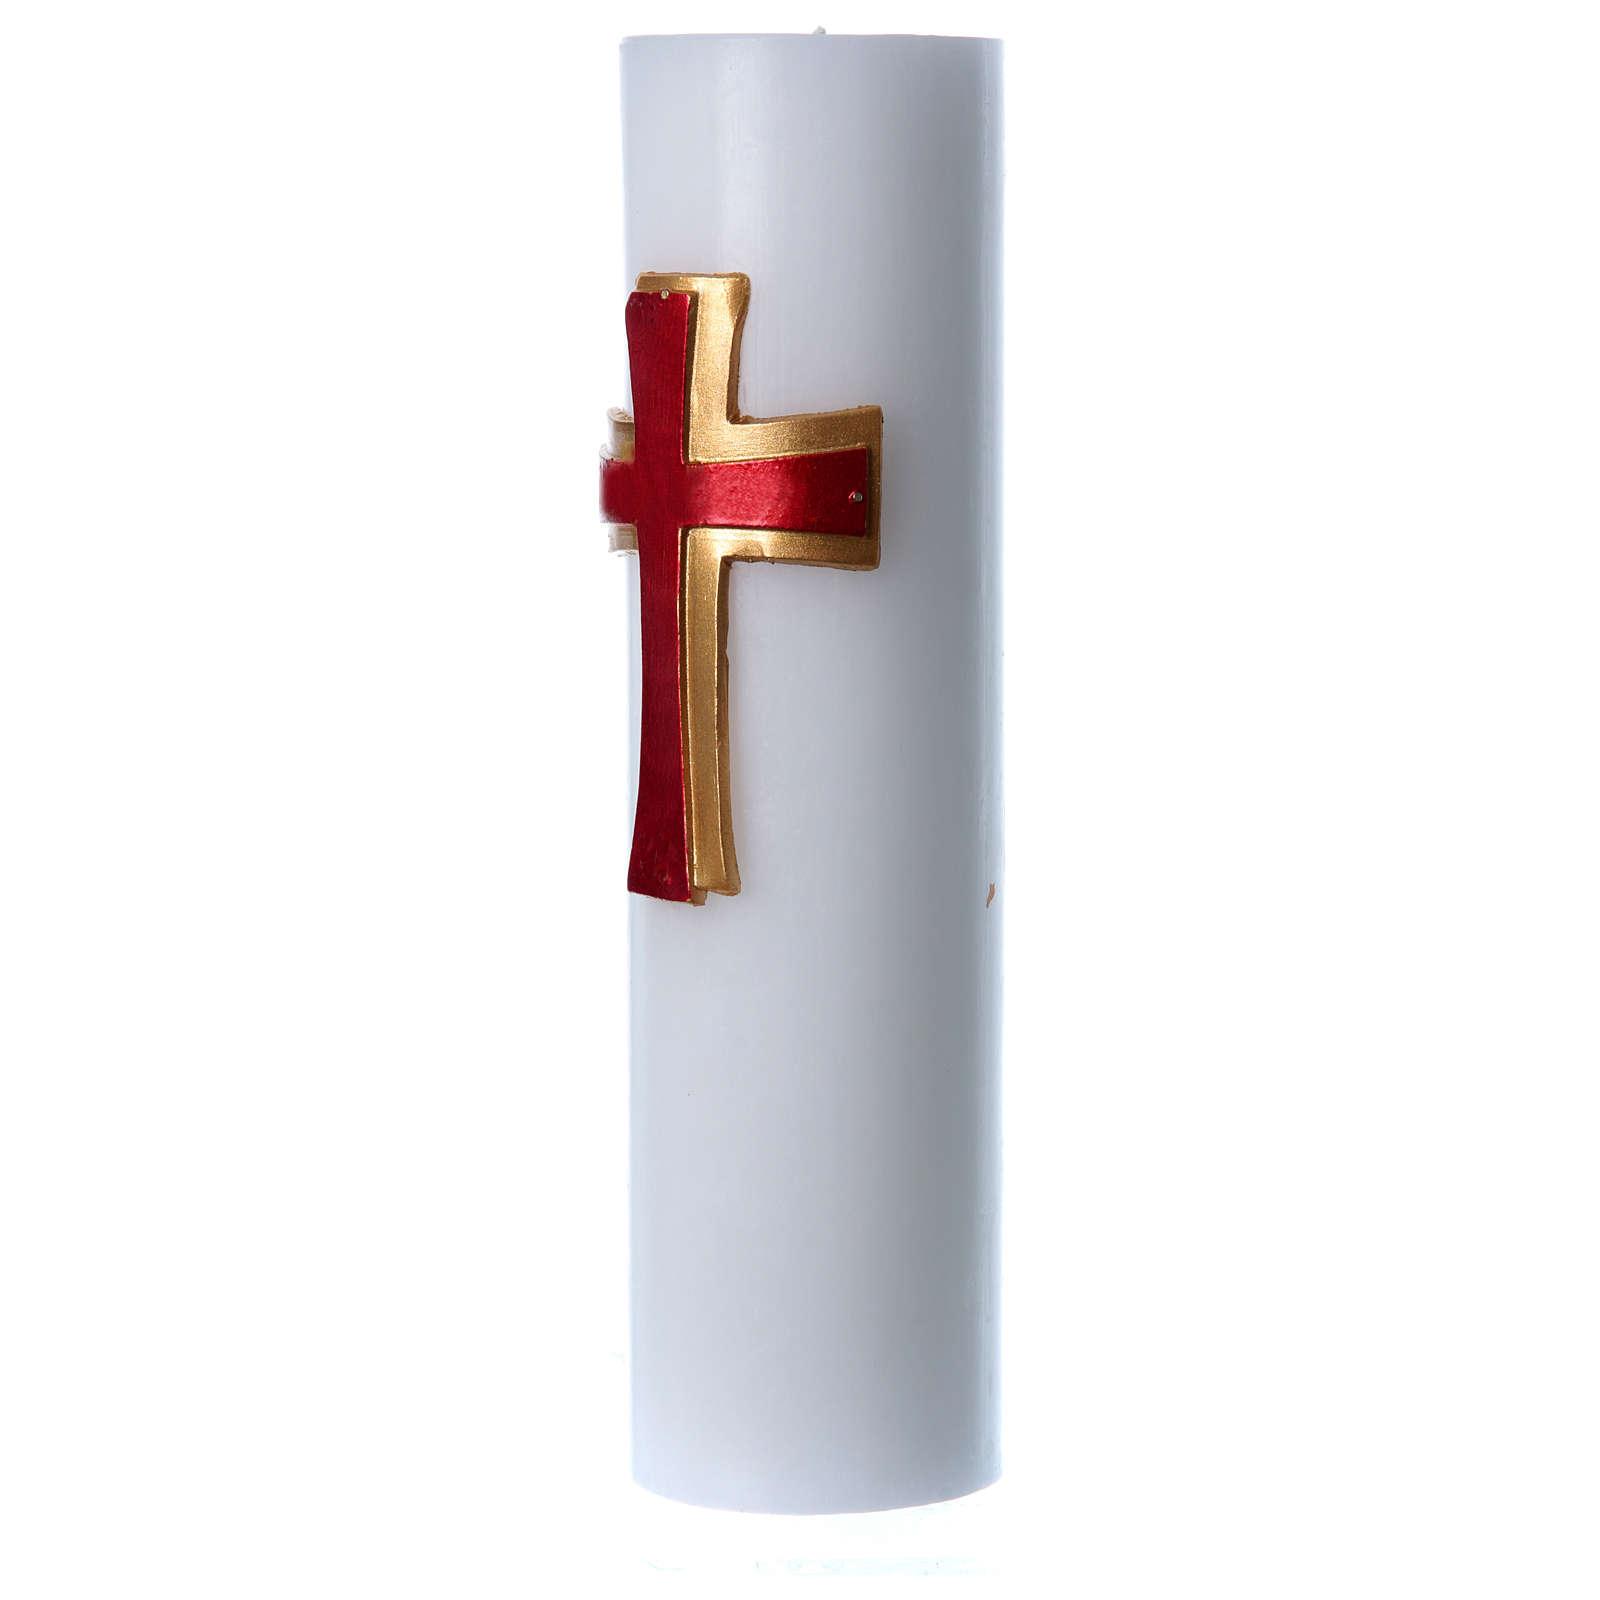 Cero da altare bassorilievo cera bianca croce rossa diam 8 cm 3